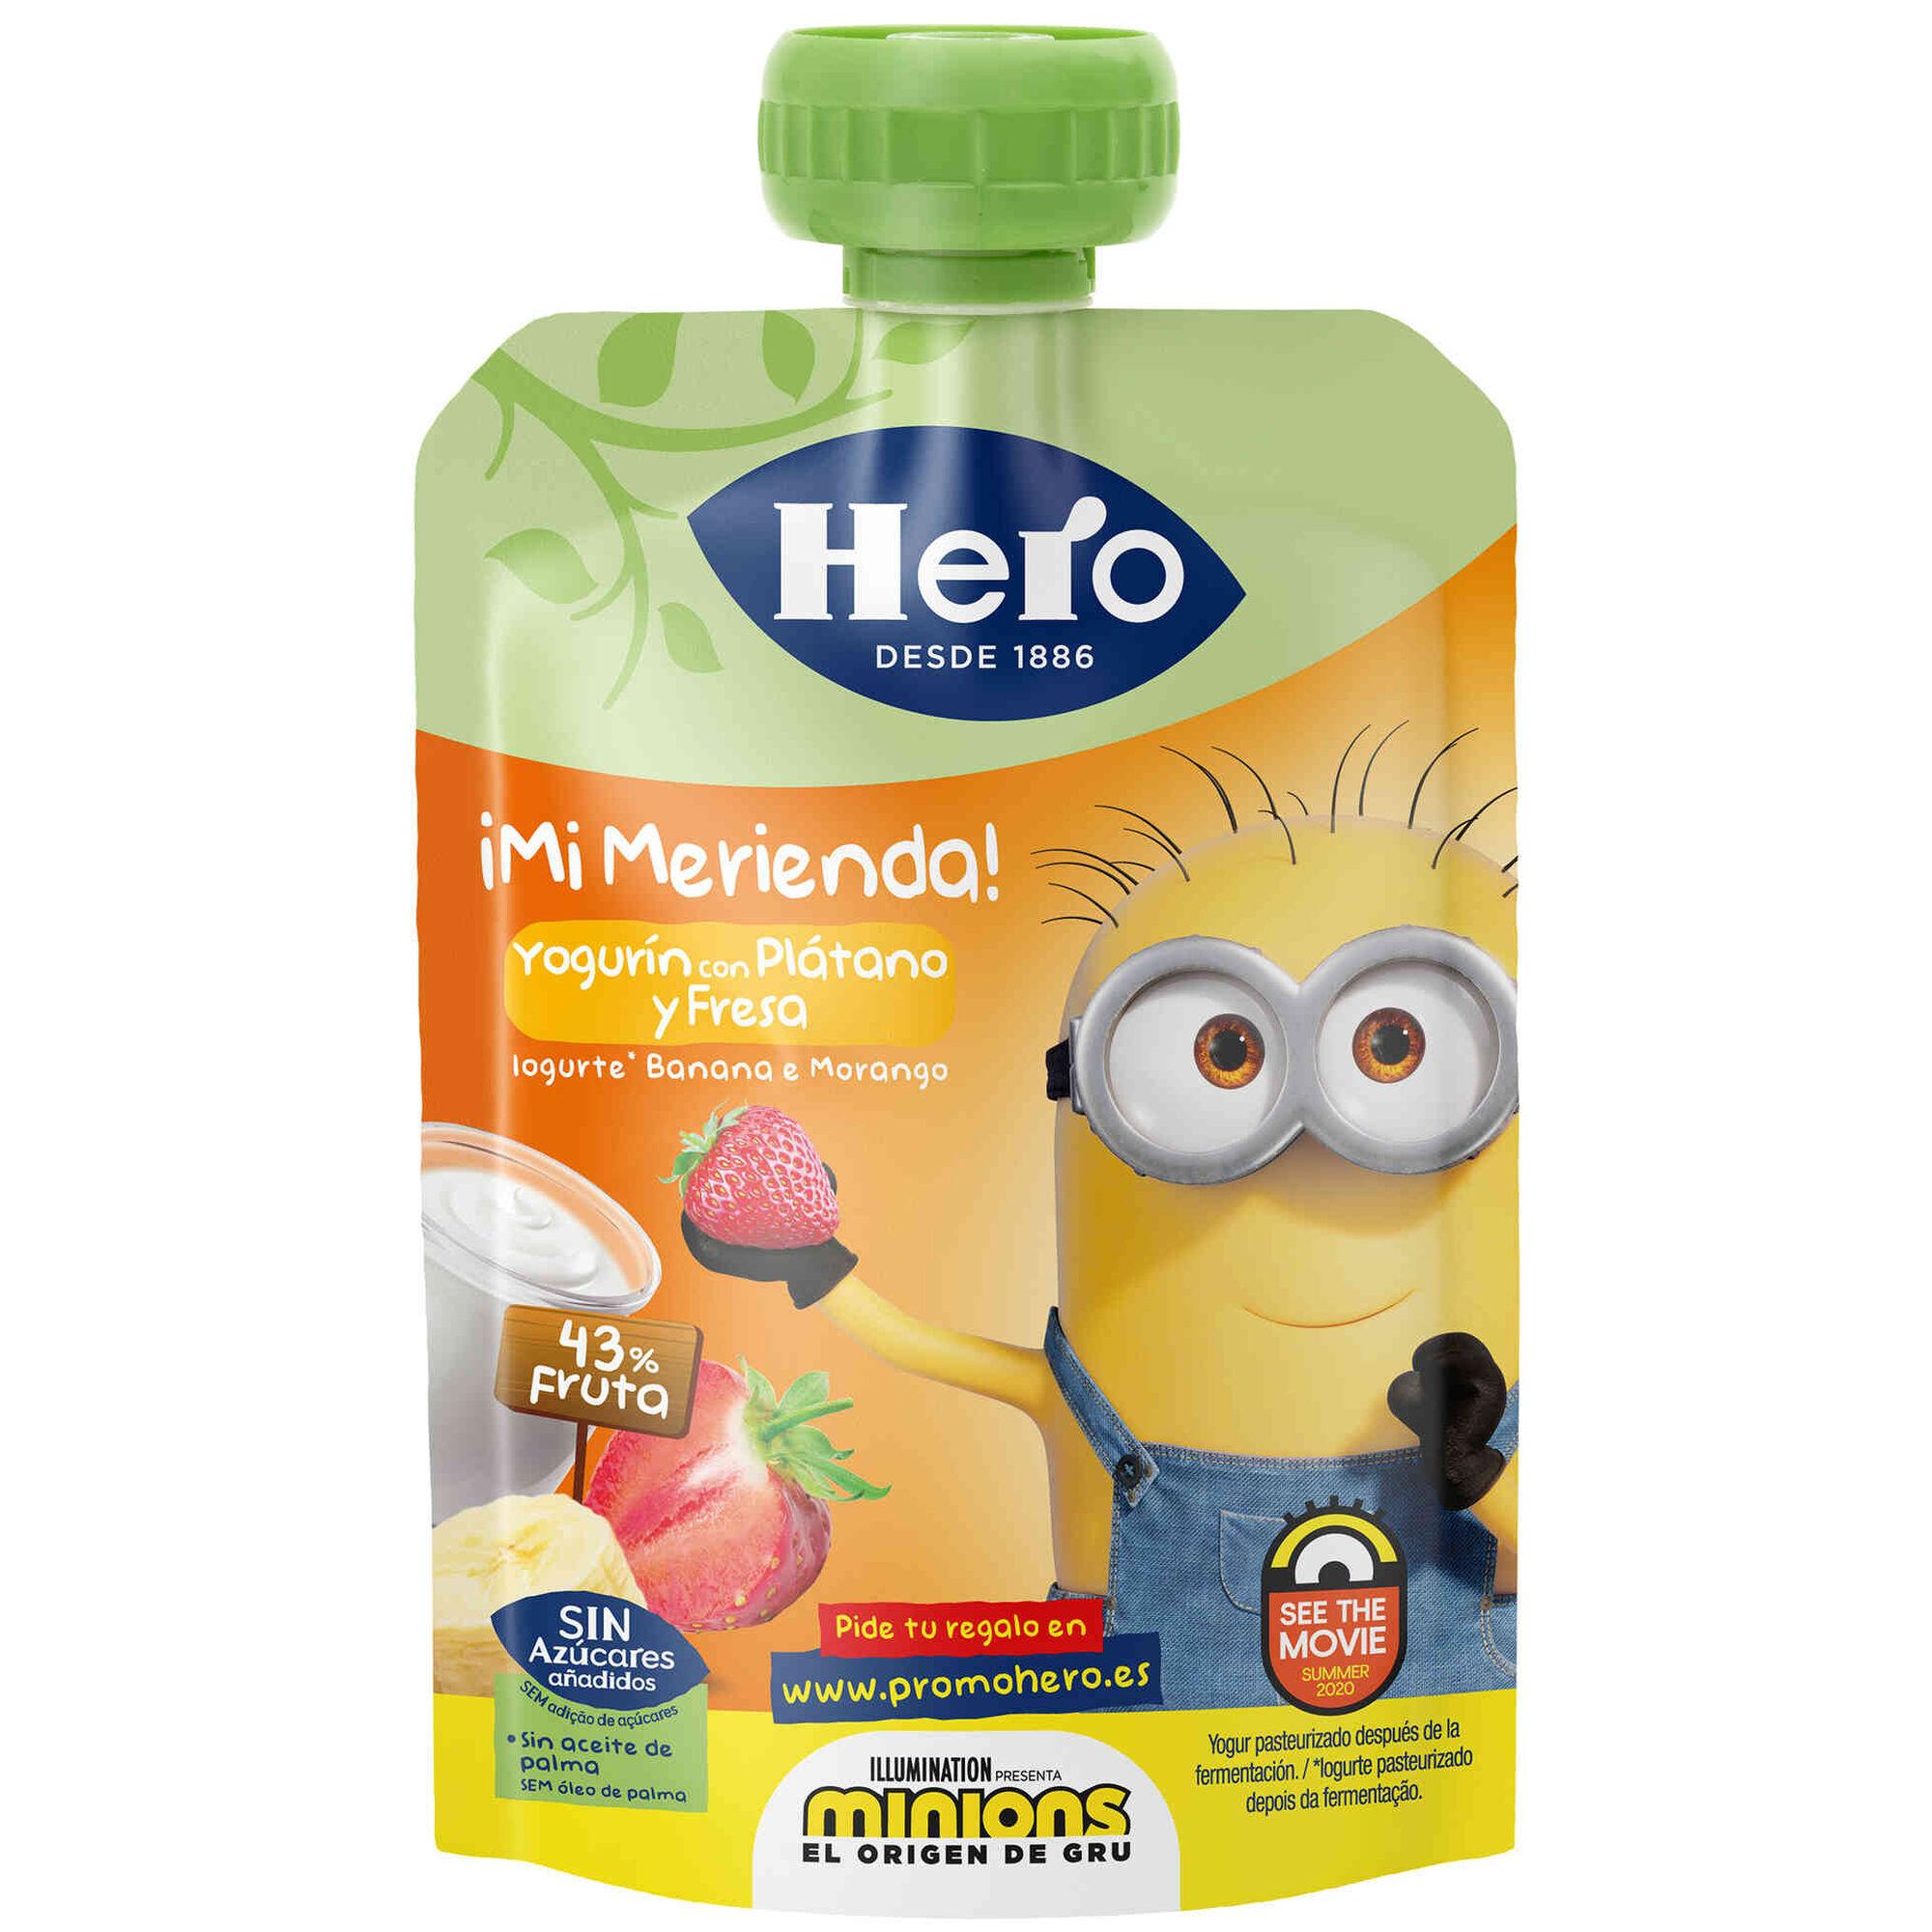 Saqueta de Fruta Iogurte, Banana e Morango Minions